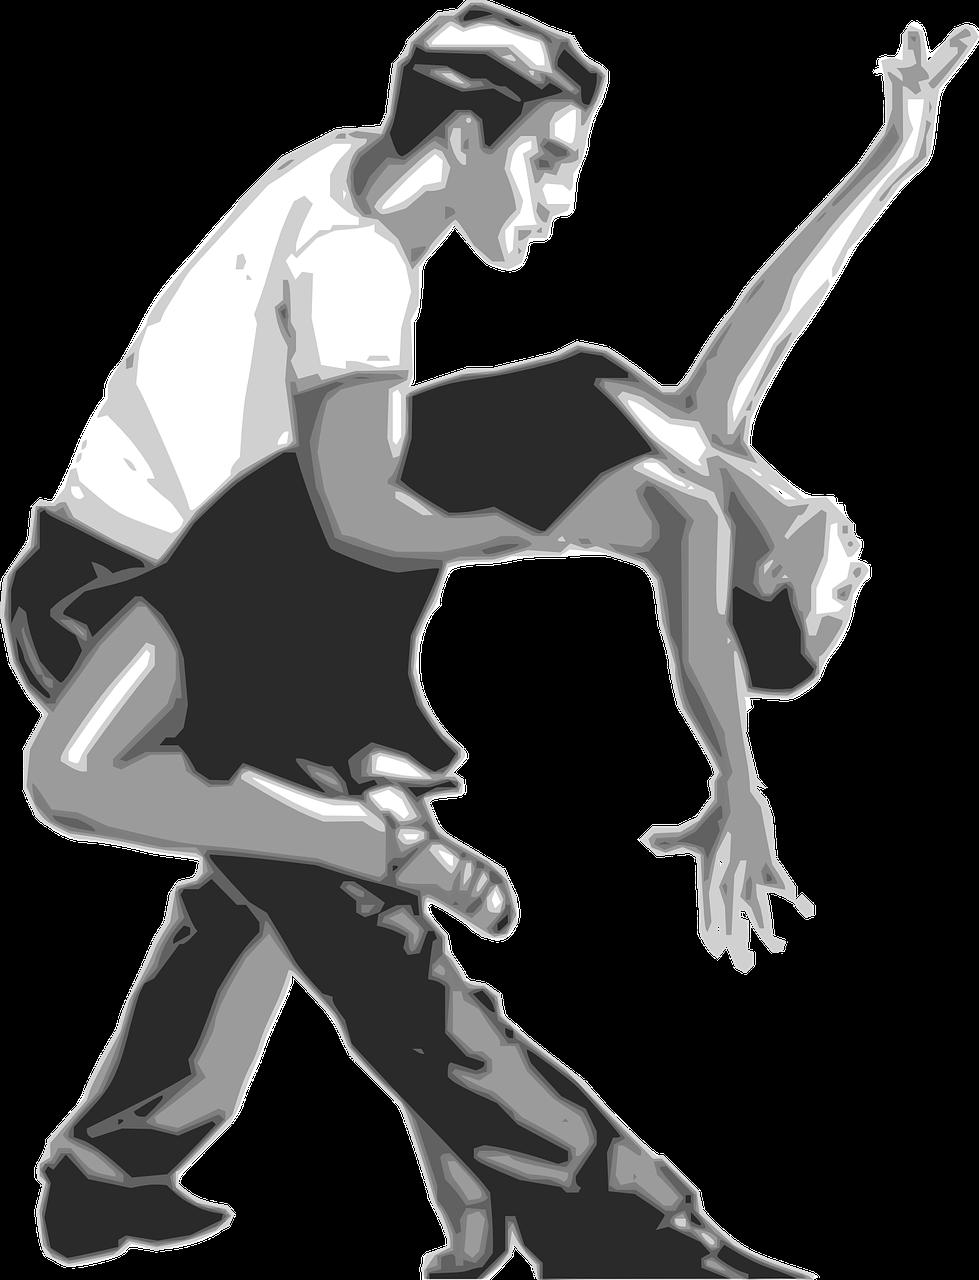 Dancing in dreams symbolism. Dance clipart traditional dance